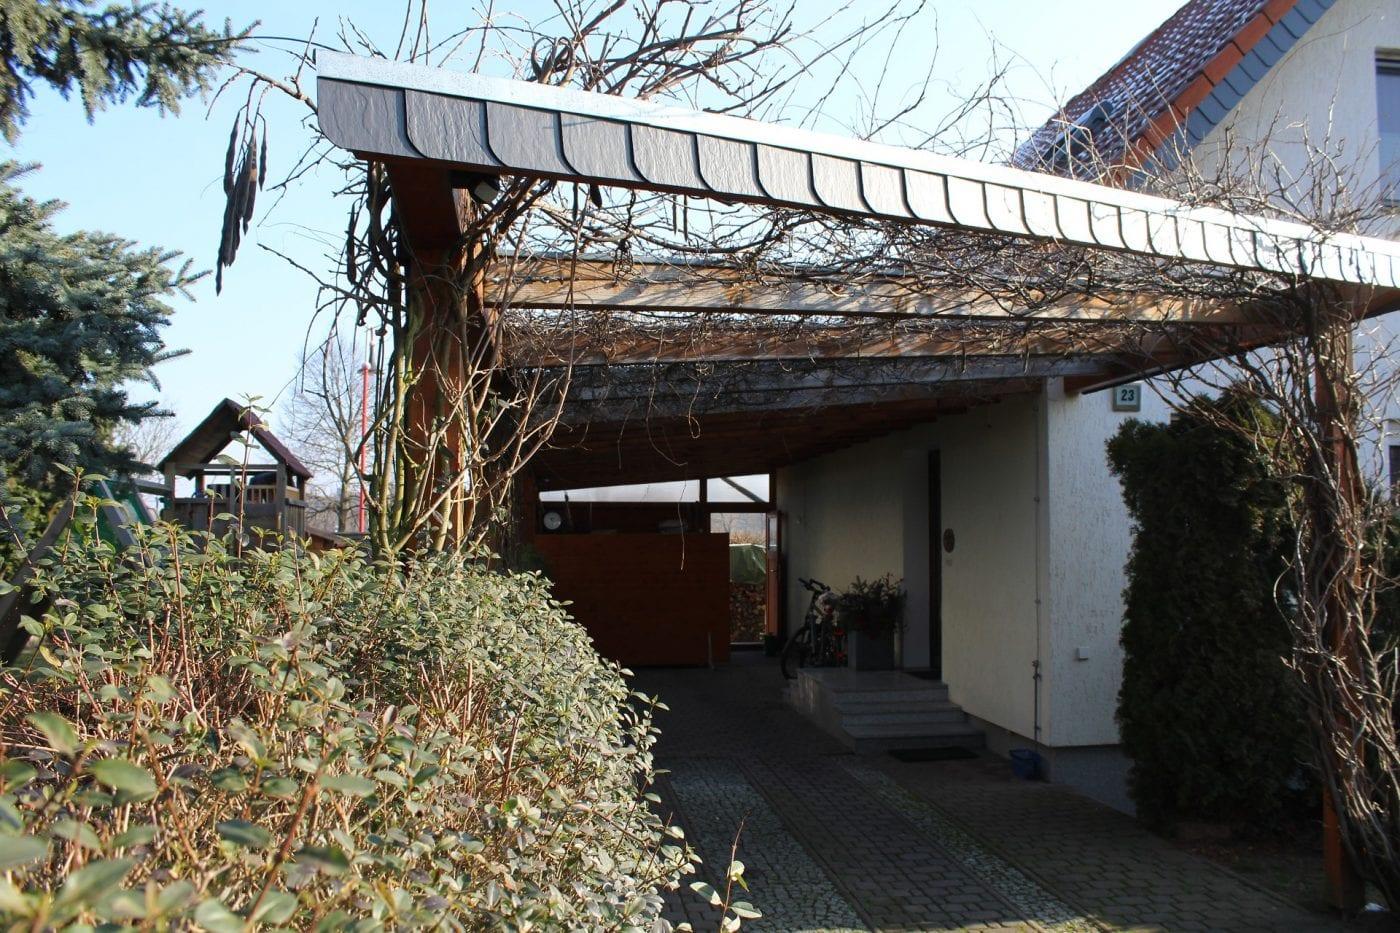 carport_verglast_frankenheim (3)